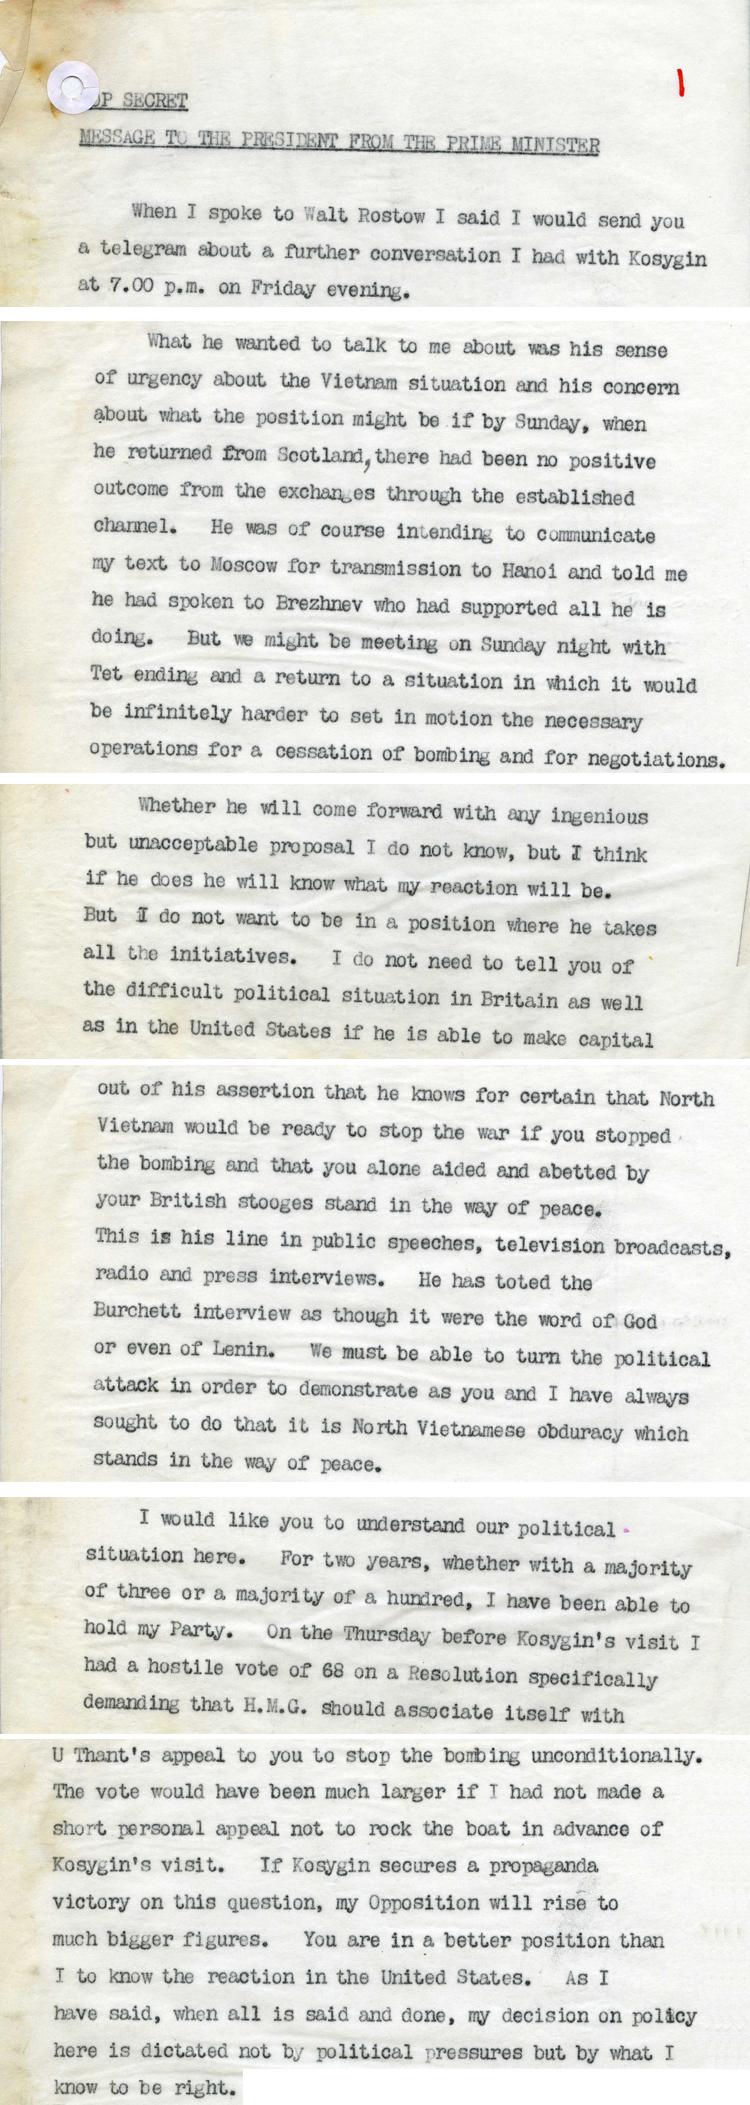 Message from Prime Minister Harold Wilson to US President Lyndon Johnson in February, 1967 (PREM 13/1788)